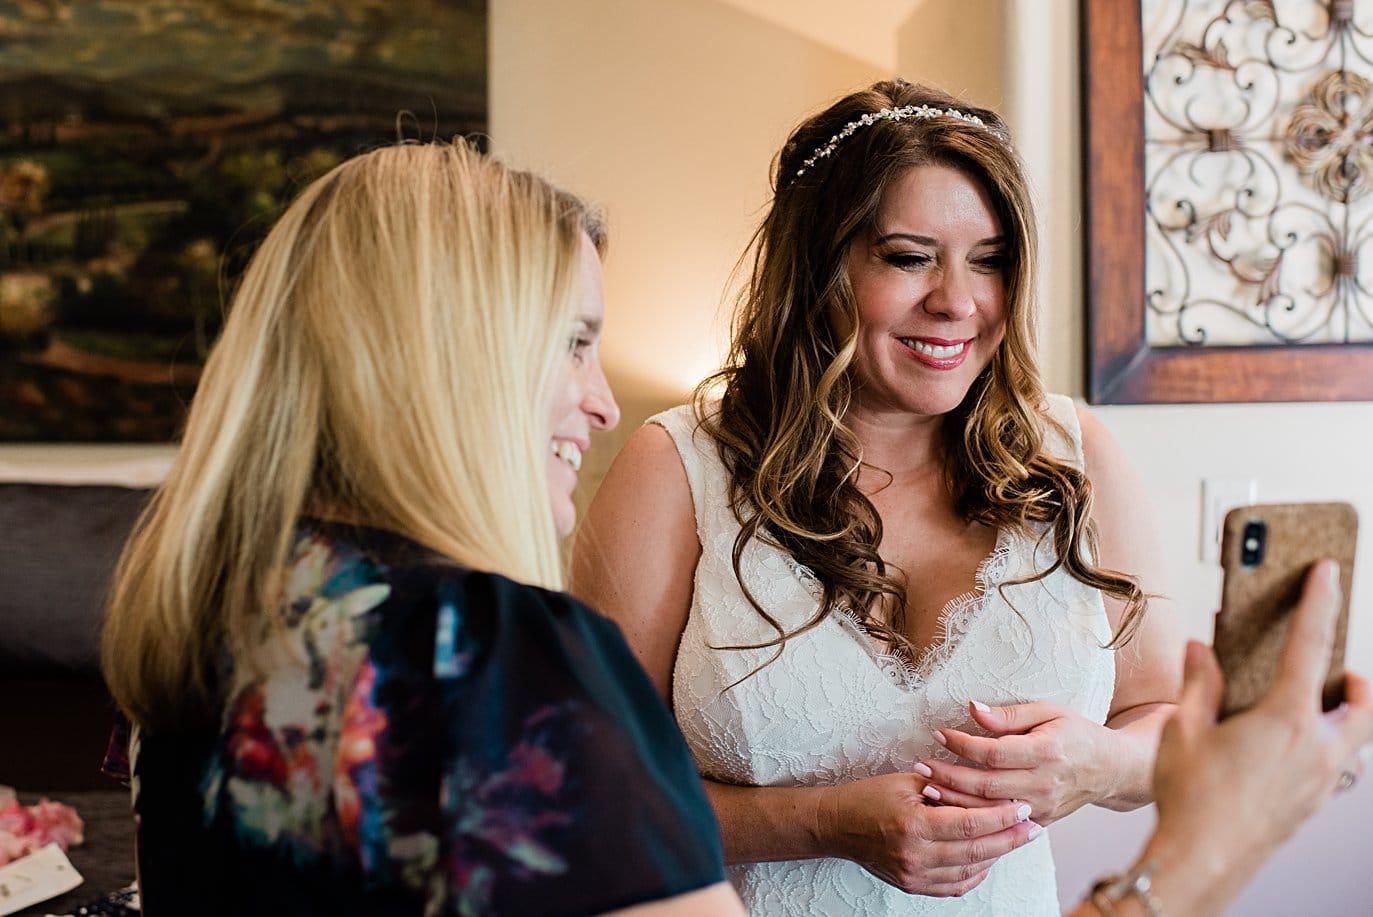 bride facetiming parents during COVID wedding at Lily Lake Elopement by Estes Park elopement photographer Jennie Crate